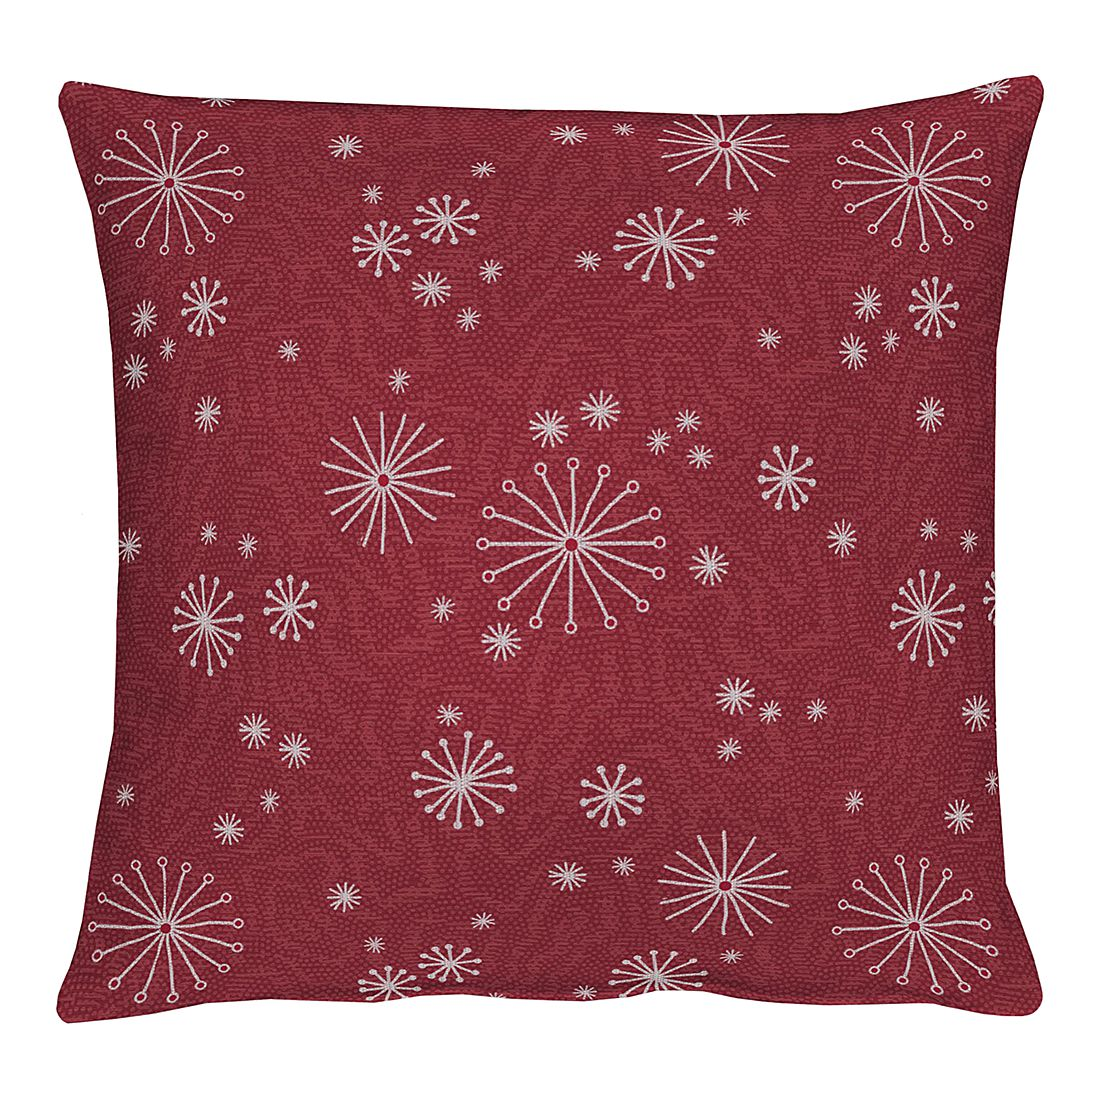 Kissenhülle Christmas Elegance I – Rot, Apelt günstig kaufen